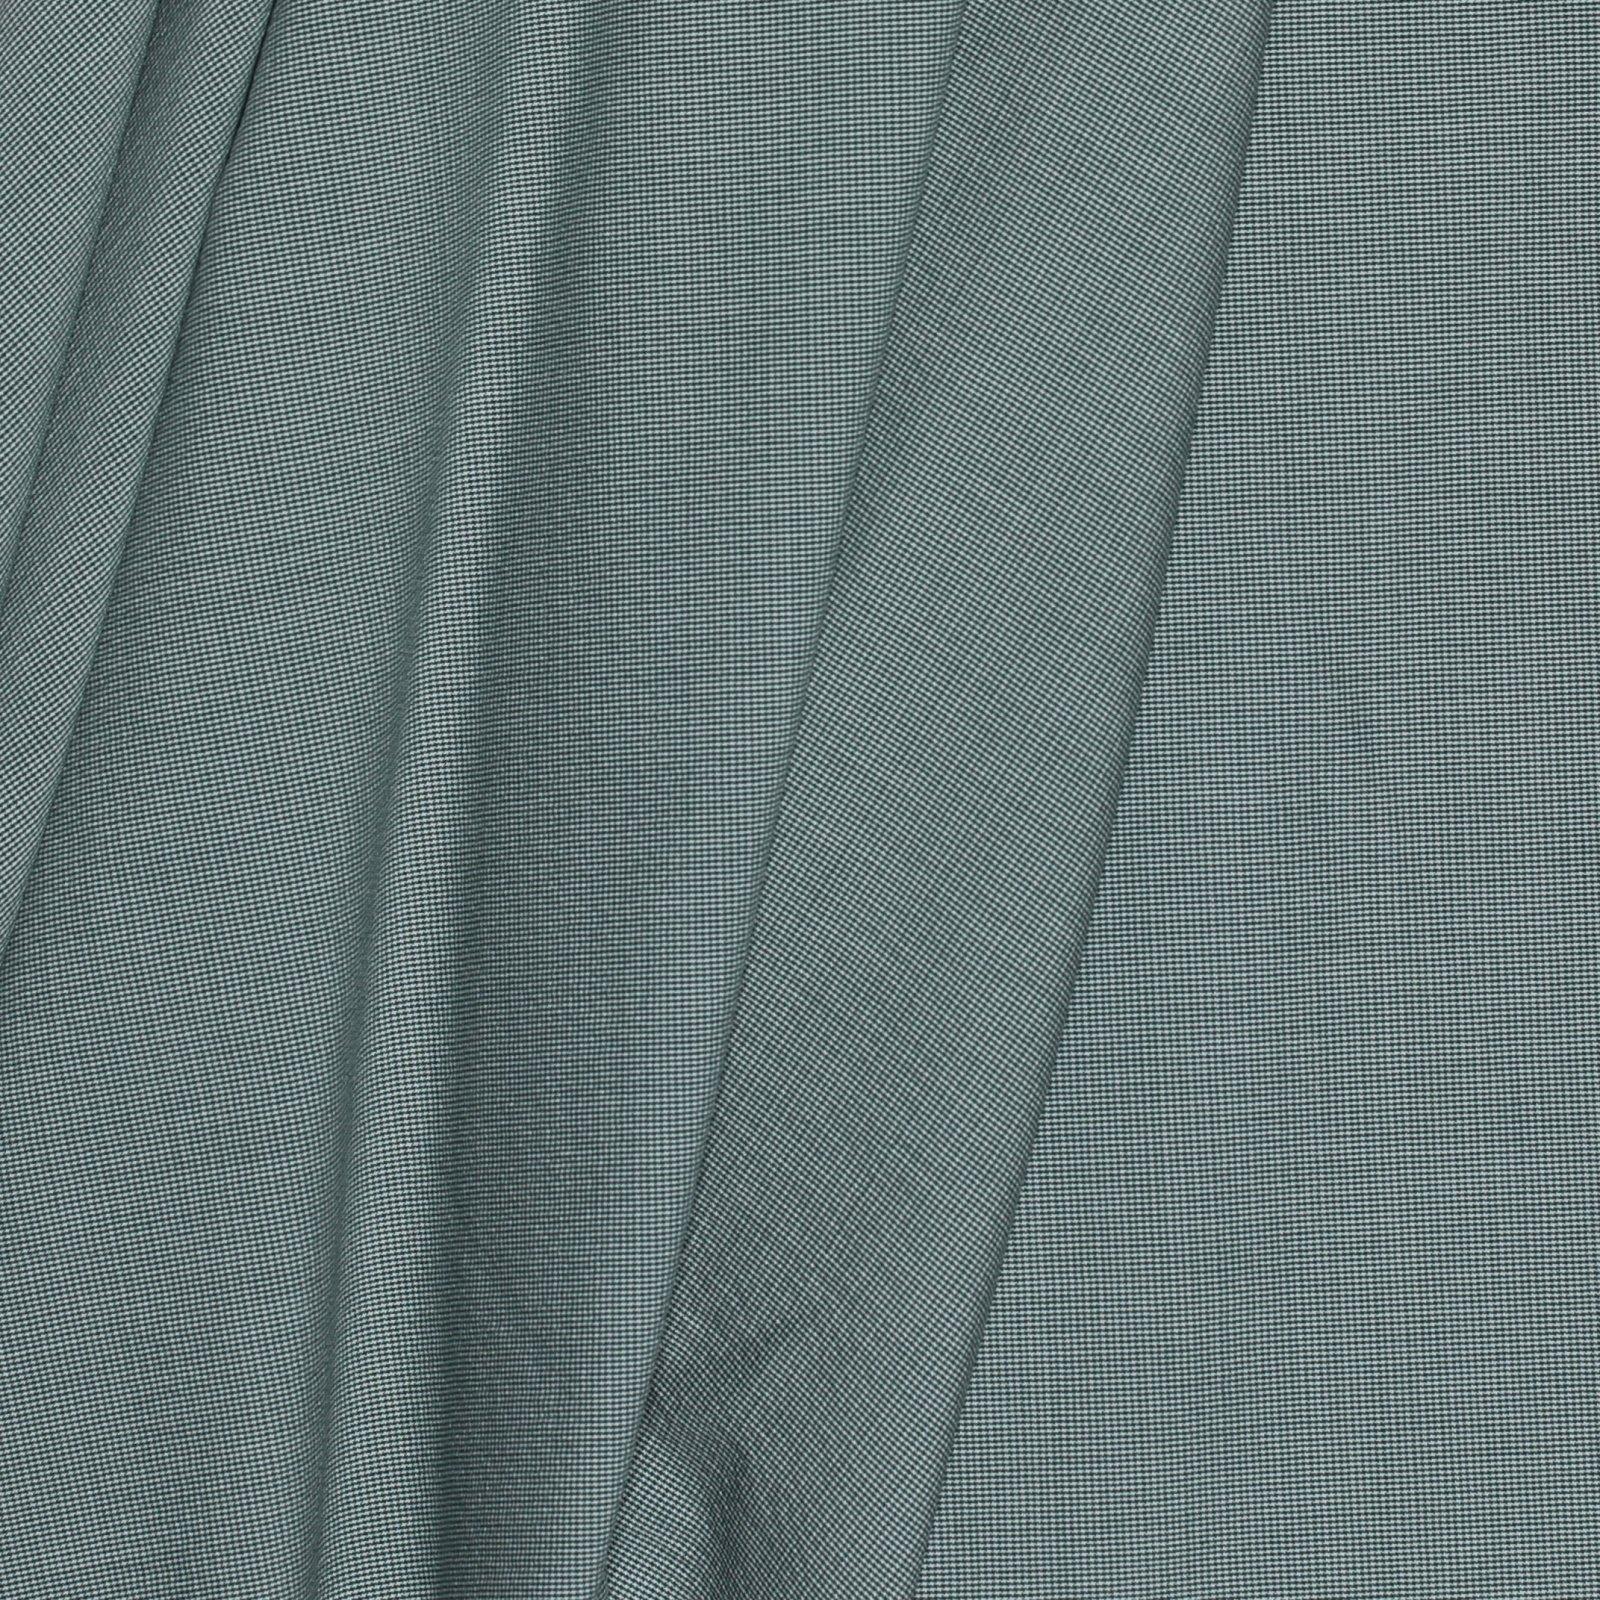 Green Tiny Houndstooth Italian Cotton/Wool/Ply